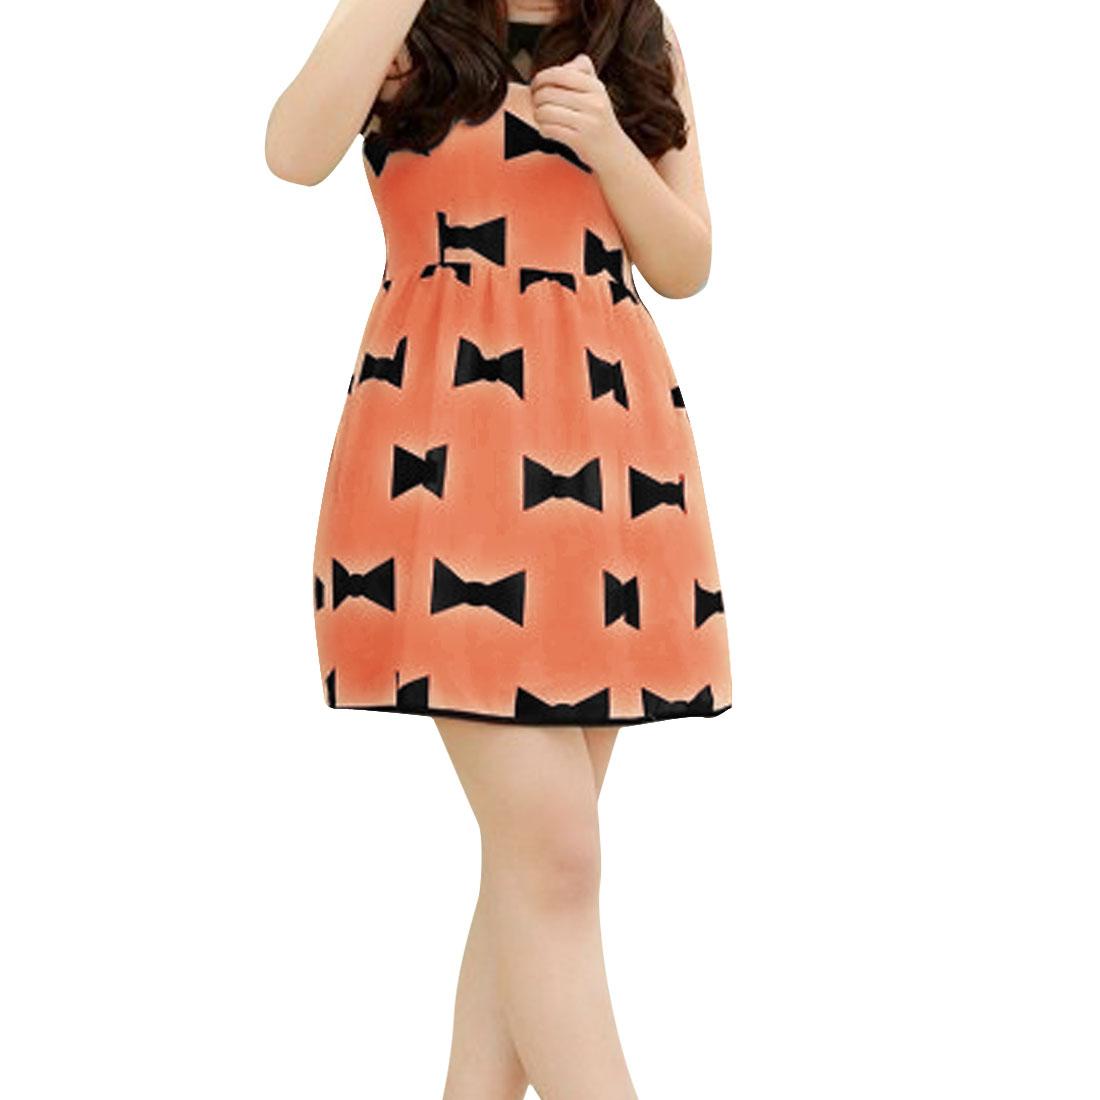 Women New Style Round Neck Mesh Splice Top Bowtie Pattern Apricot Mini Dress XS